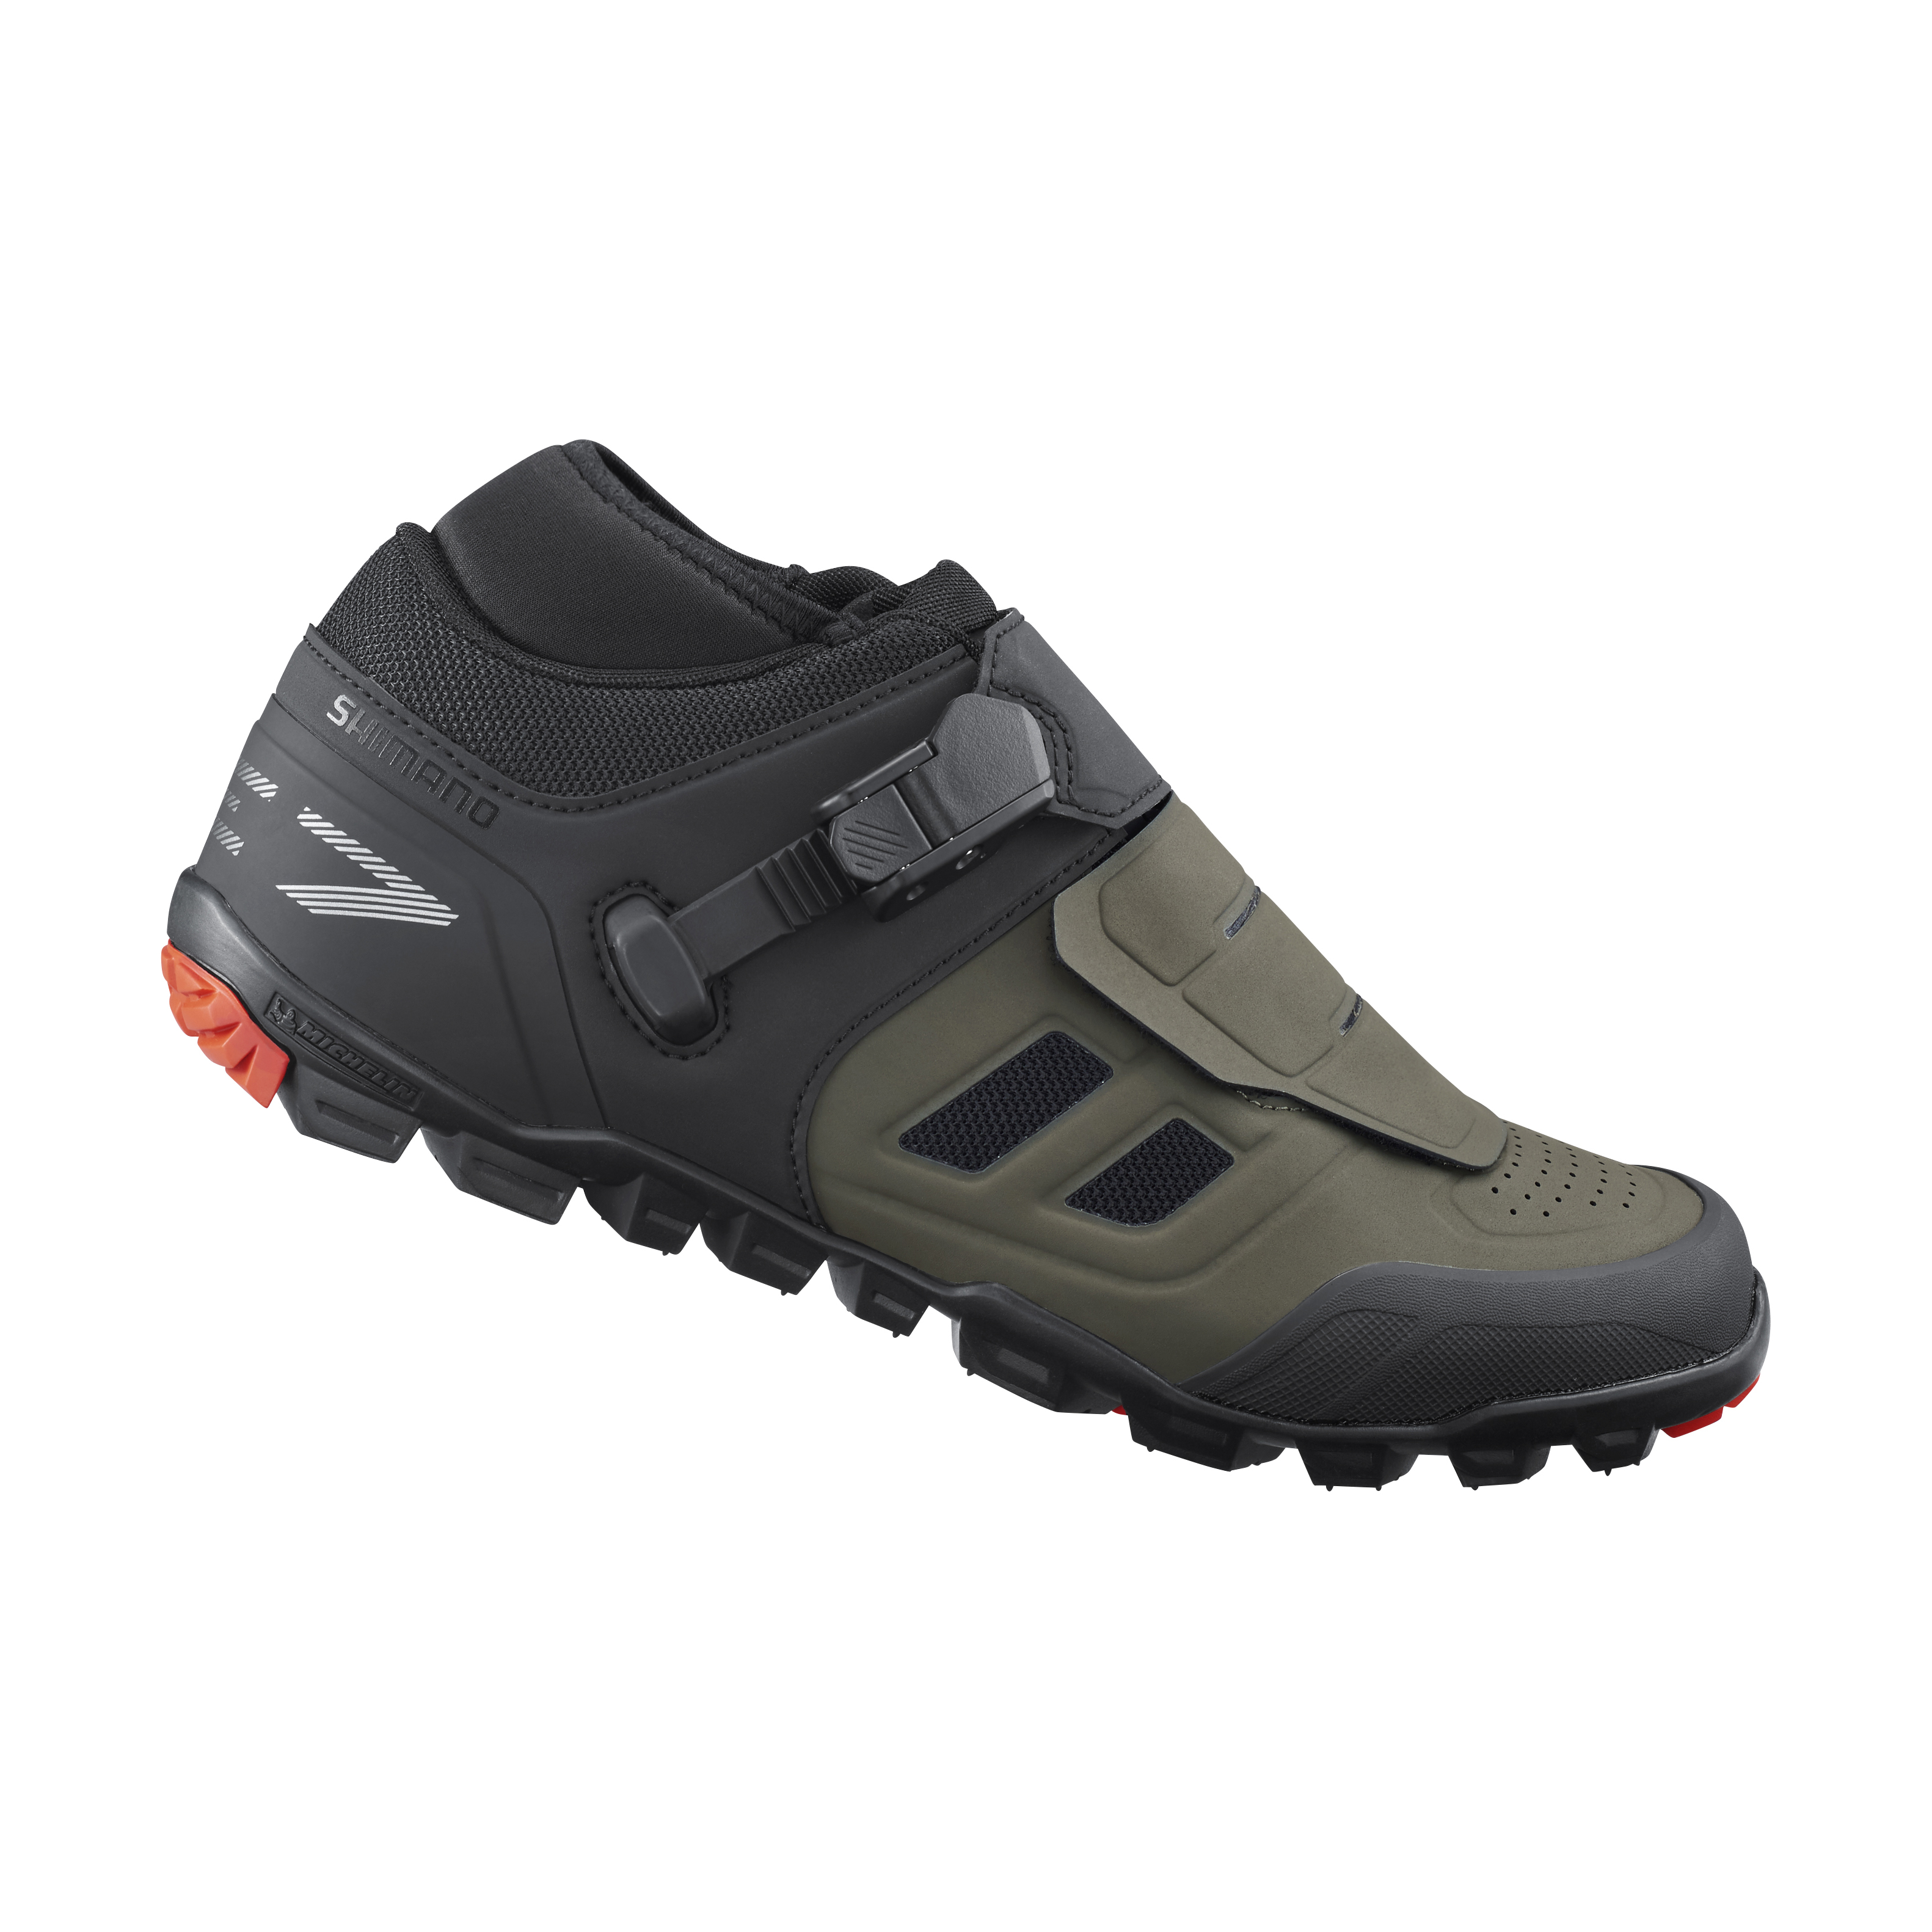 SHIMANO MTB obuv SH-ME702, olivová, 41